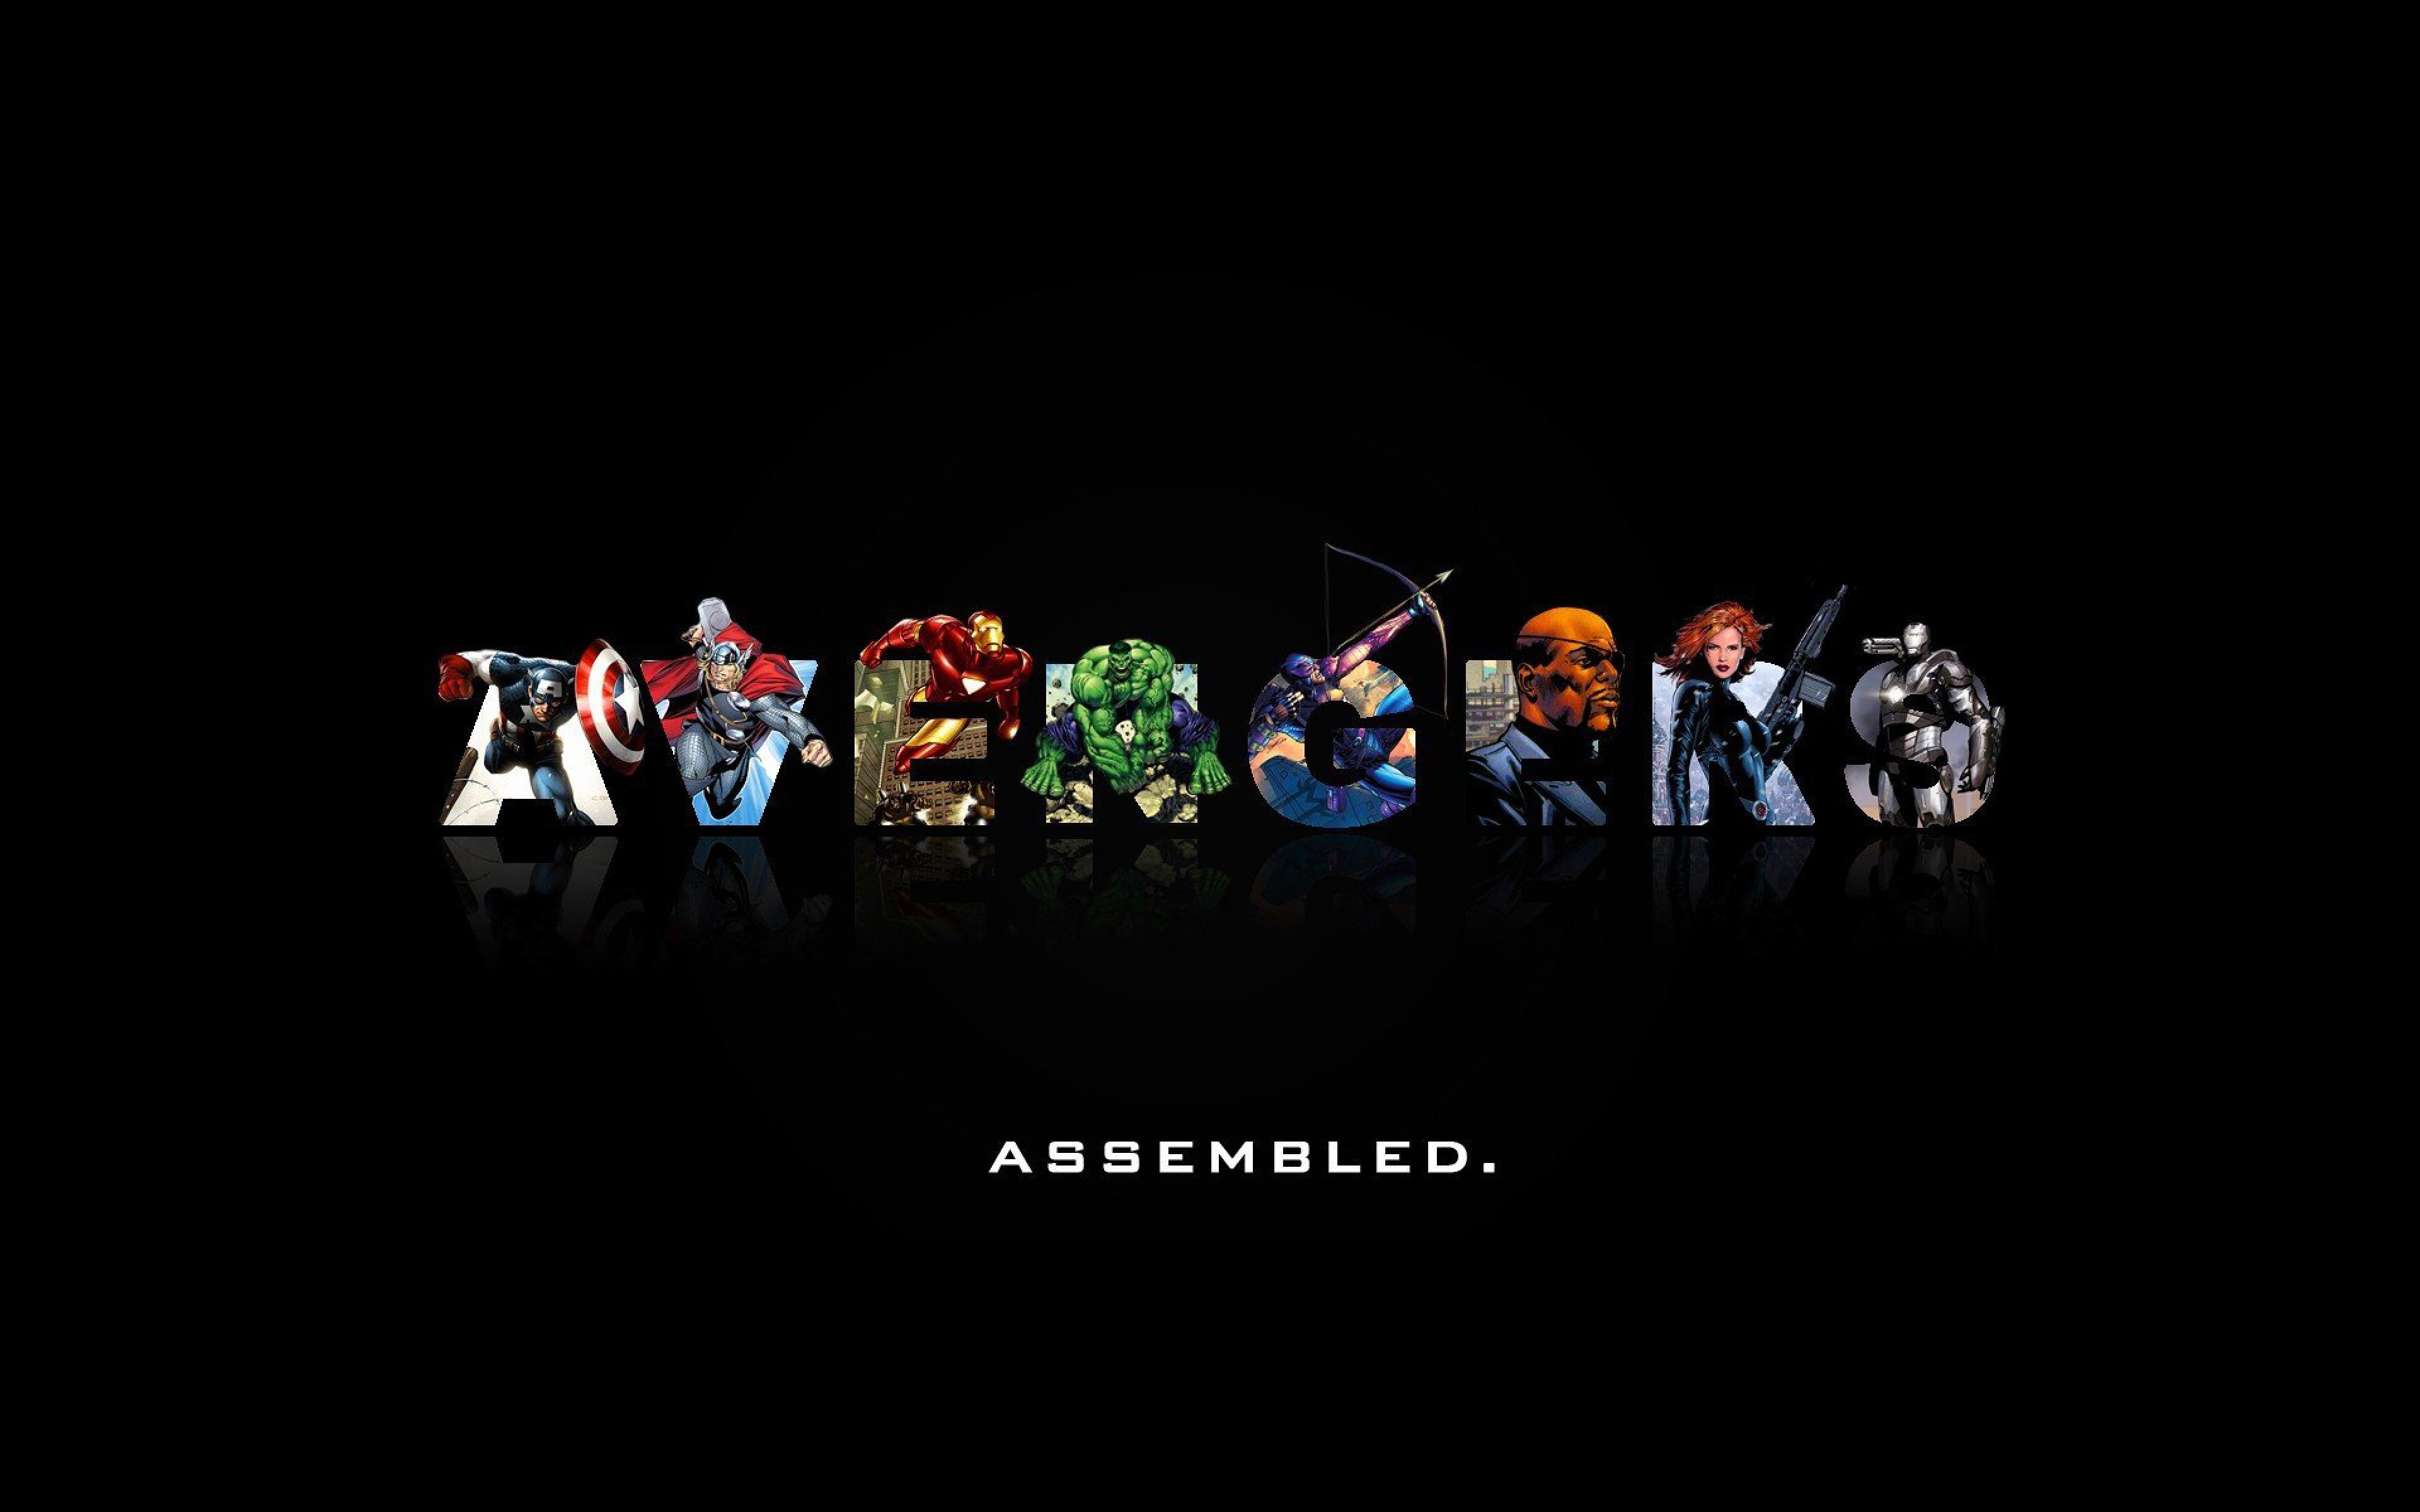 Download Wallpaper 3840x2400 Marvel comics The avengers Minimalism 3840x2400